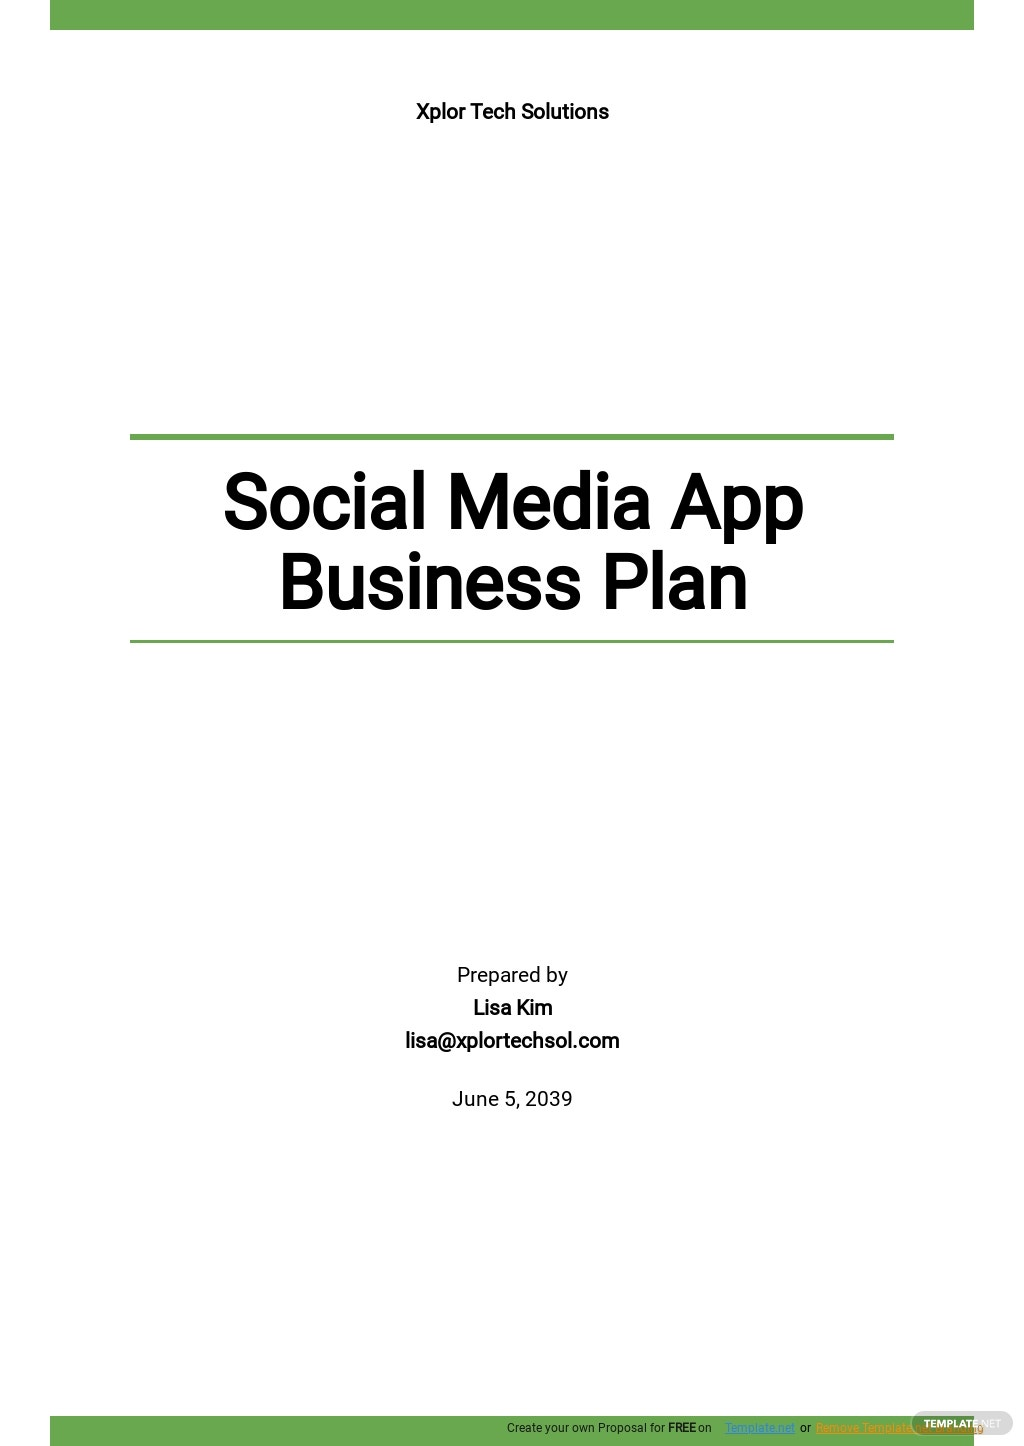 Social Media App Business Plan Template.jpe